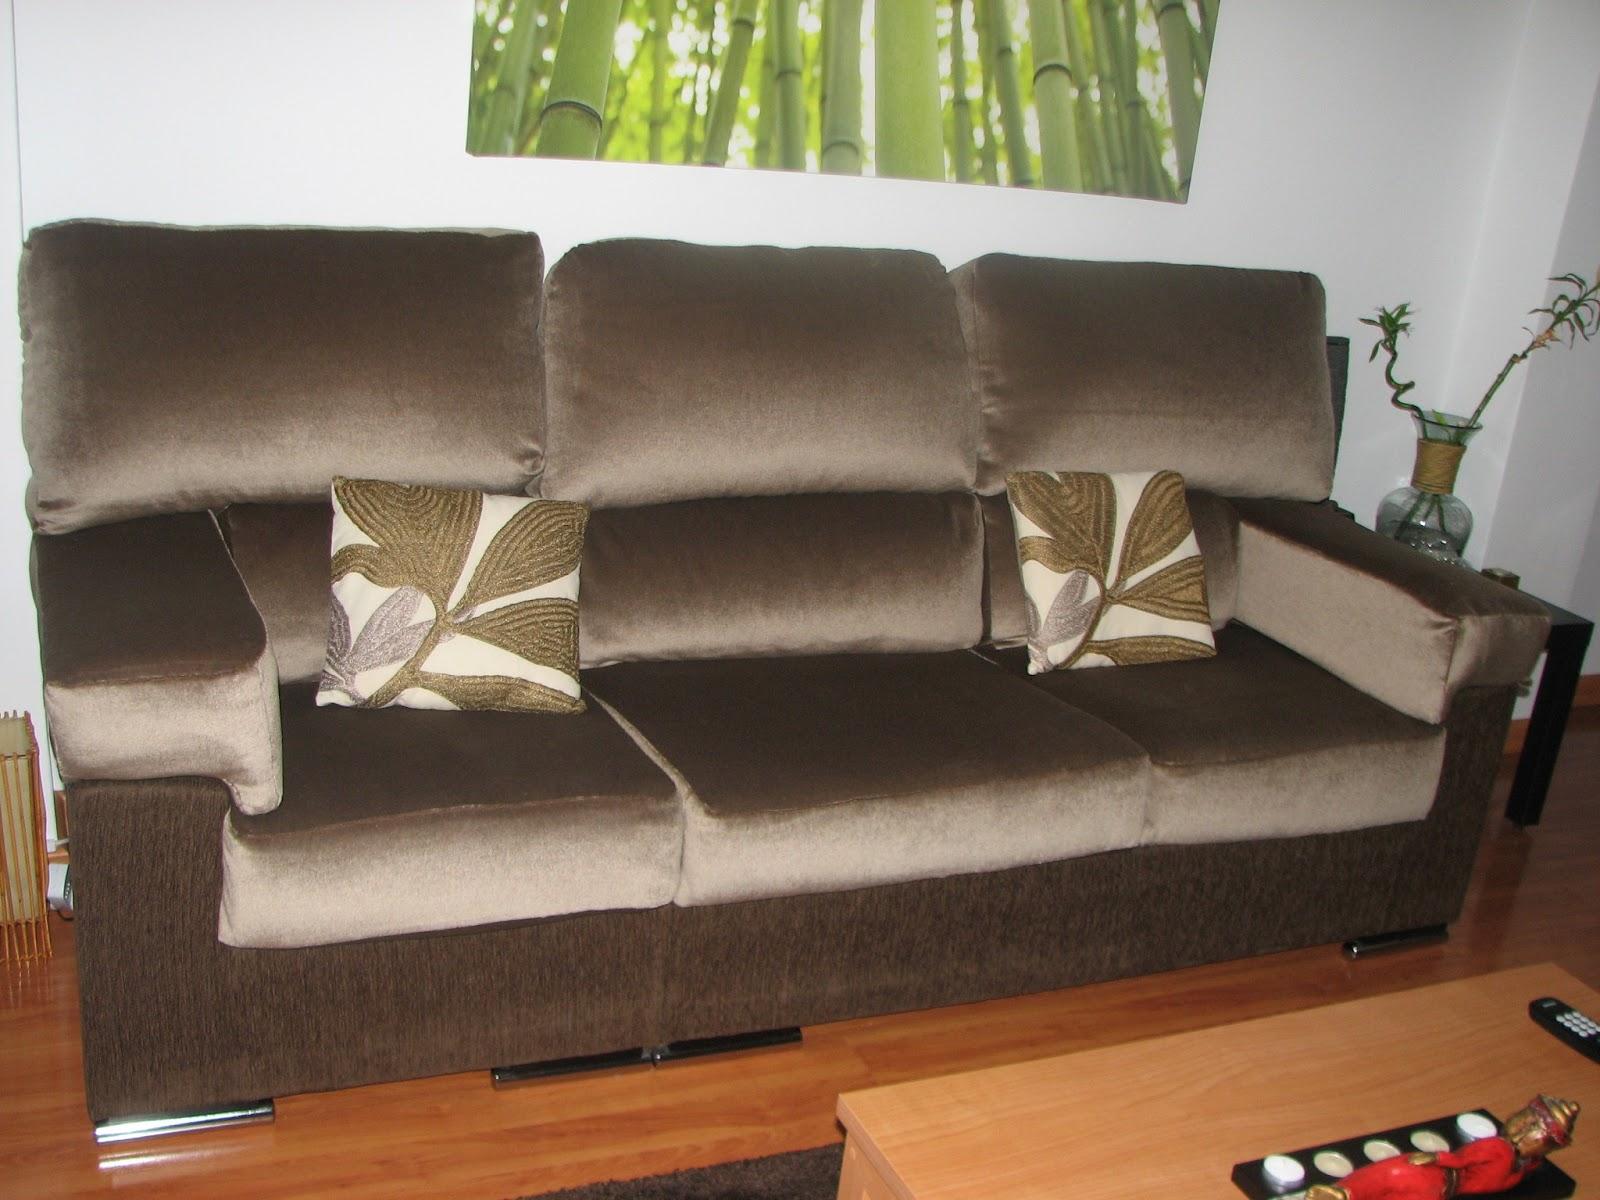 Imagenes de telas para muebles - Telas tapiceria sofas ...